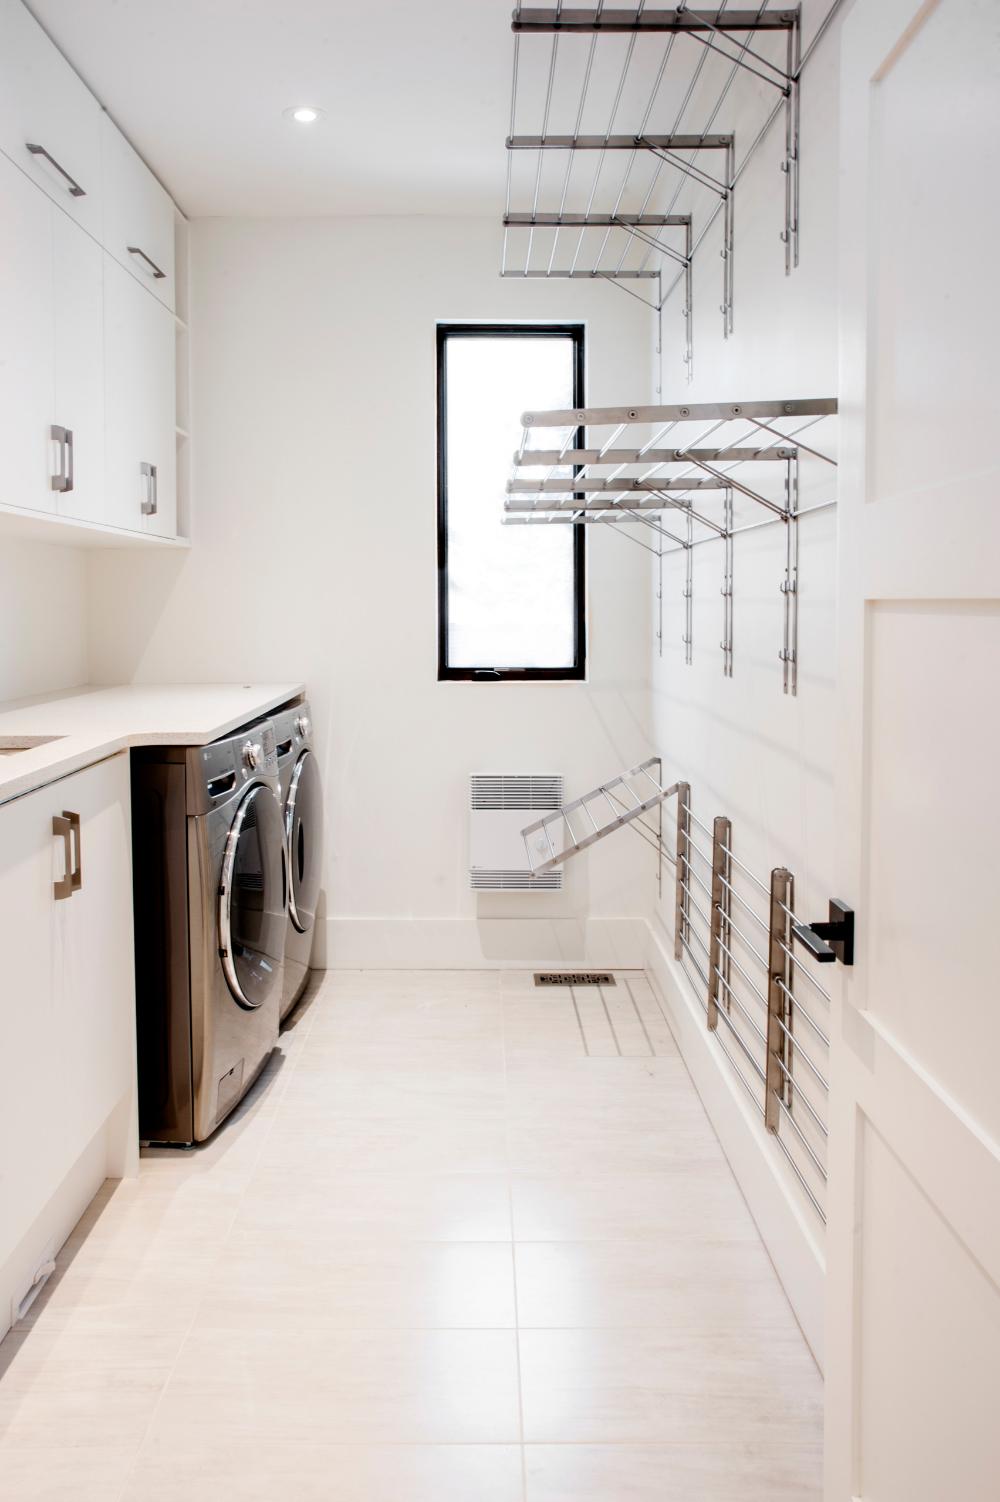 Laundry Room - Contemporary - Laundry Room - Ottawa - by Maple Leaf Custom Homes | Houzz